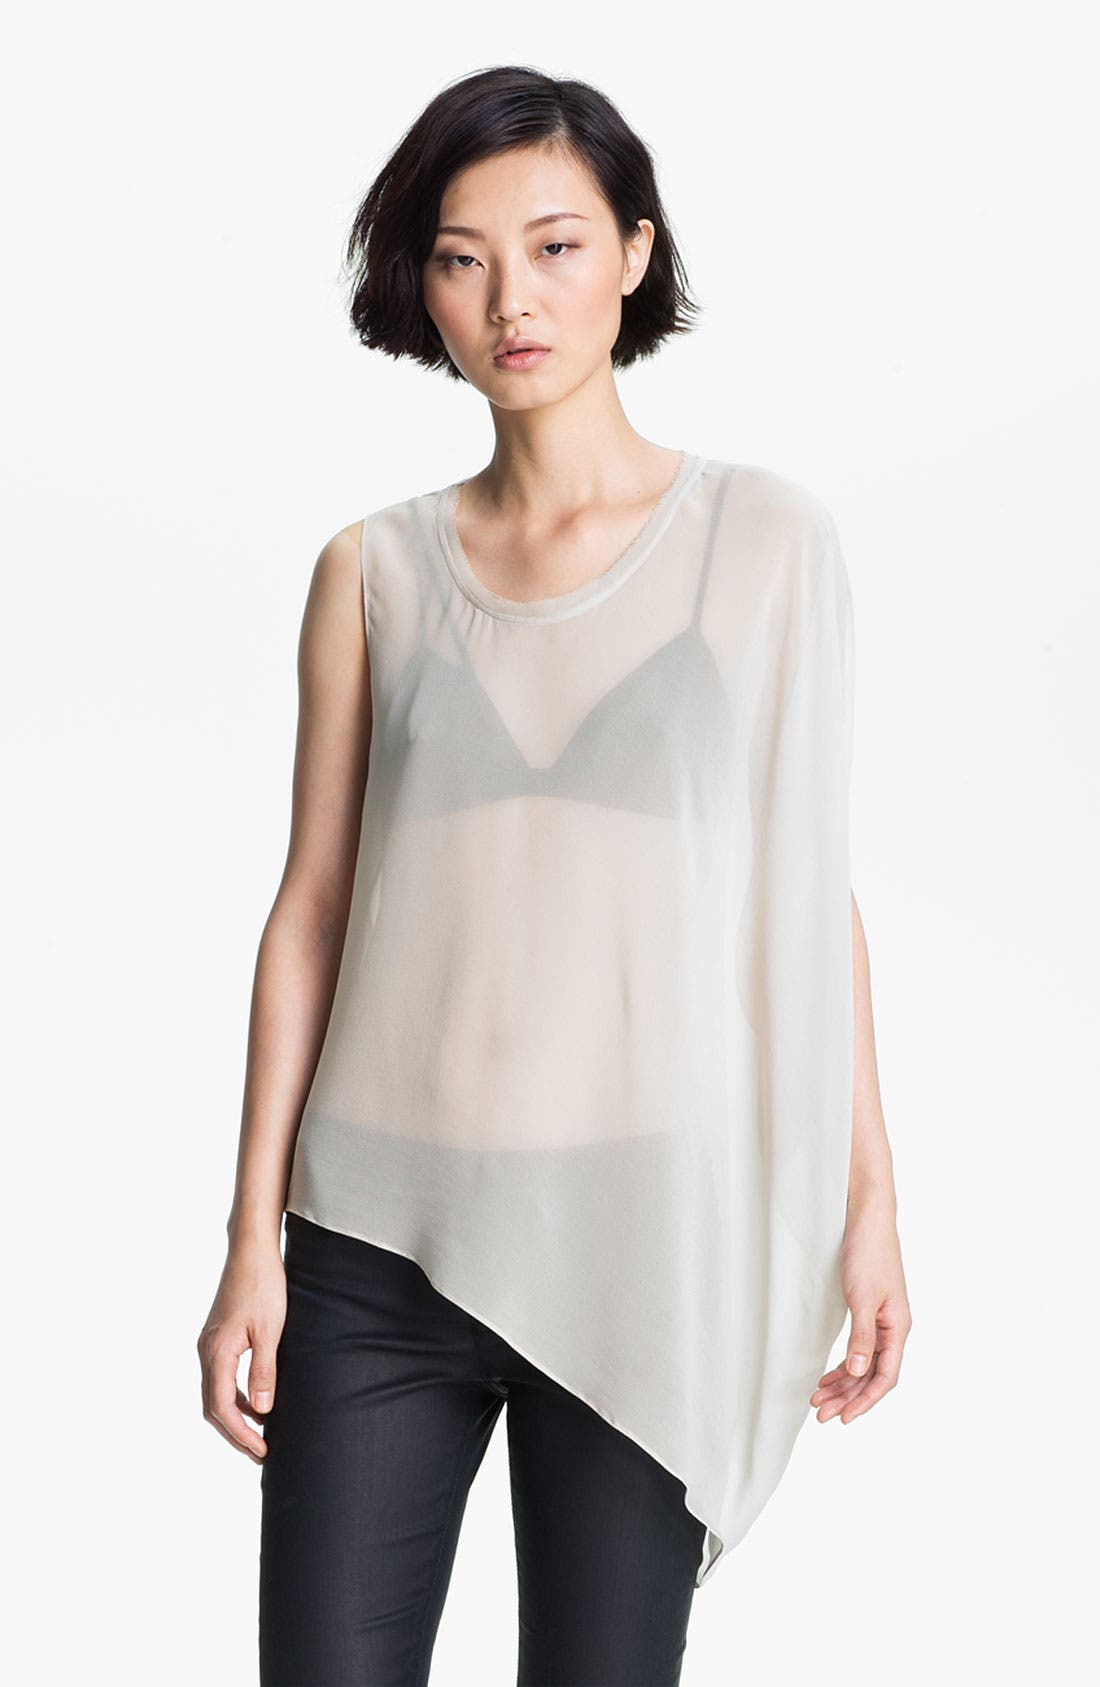 Main Image - HELMUT Helmut Lang 'Ghost Silk' Asymmetrical Top